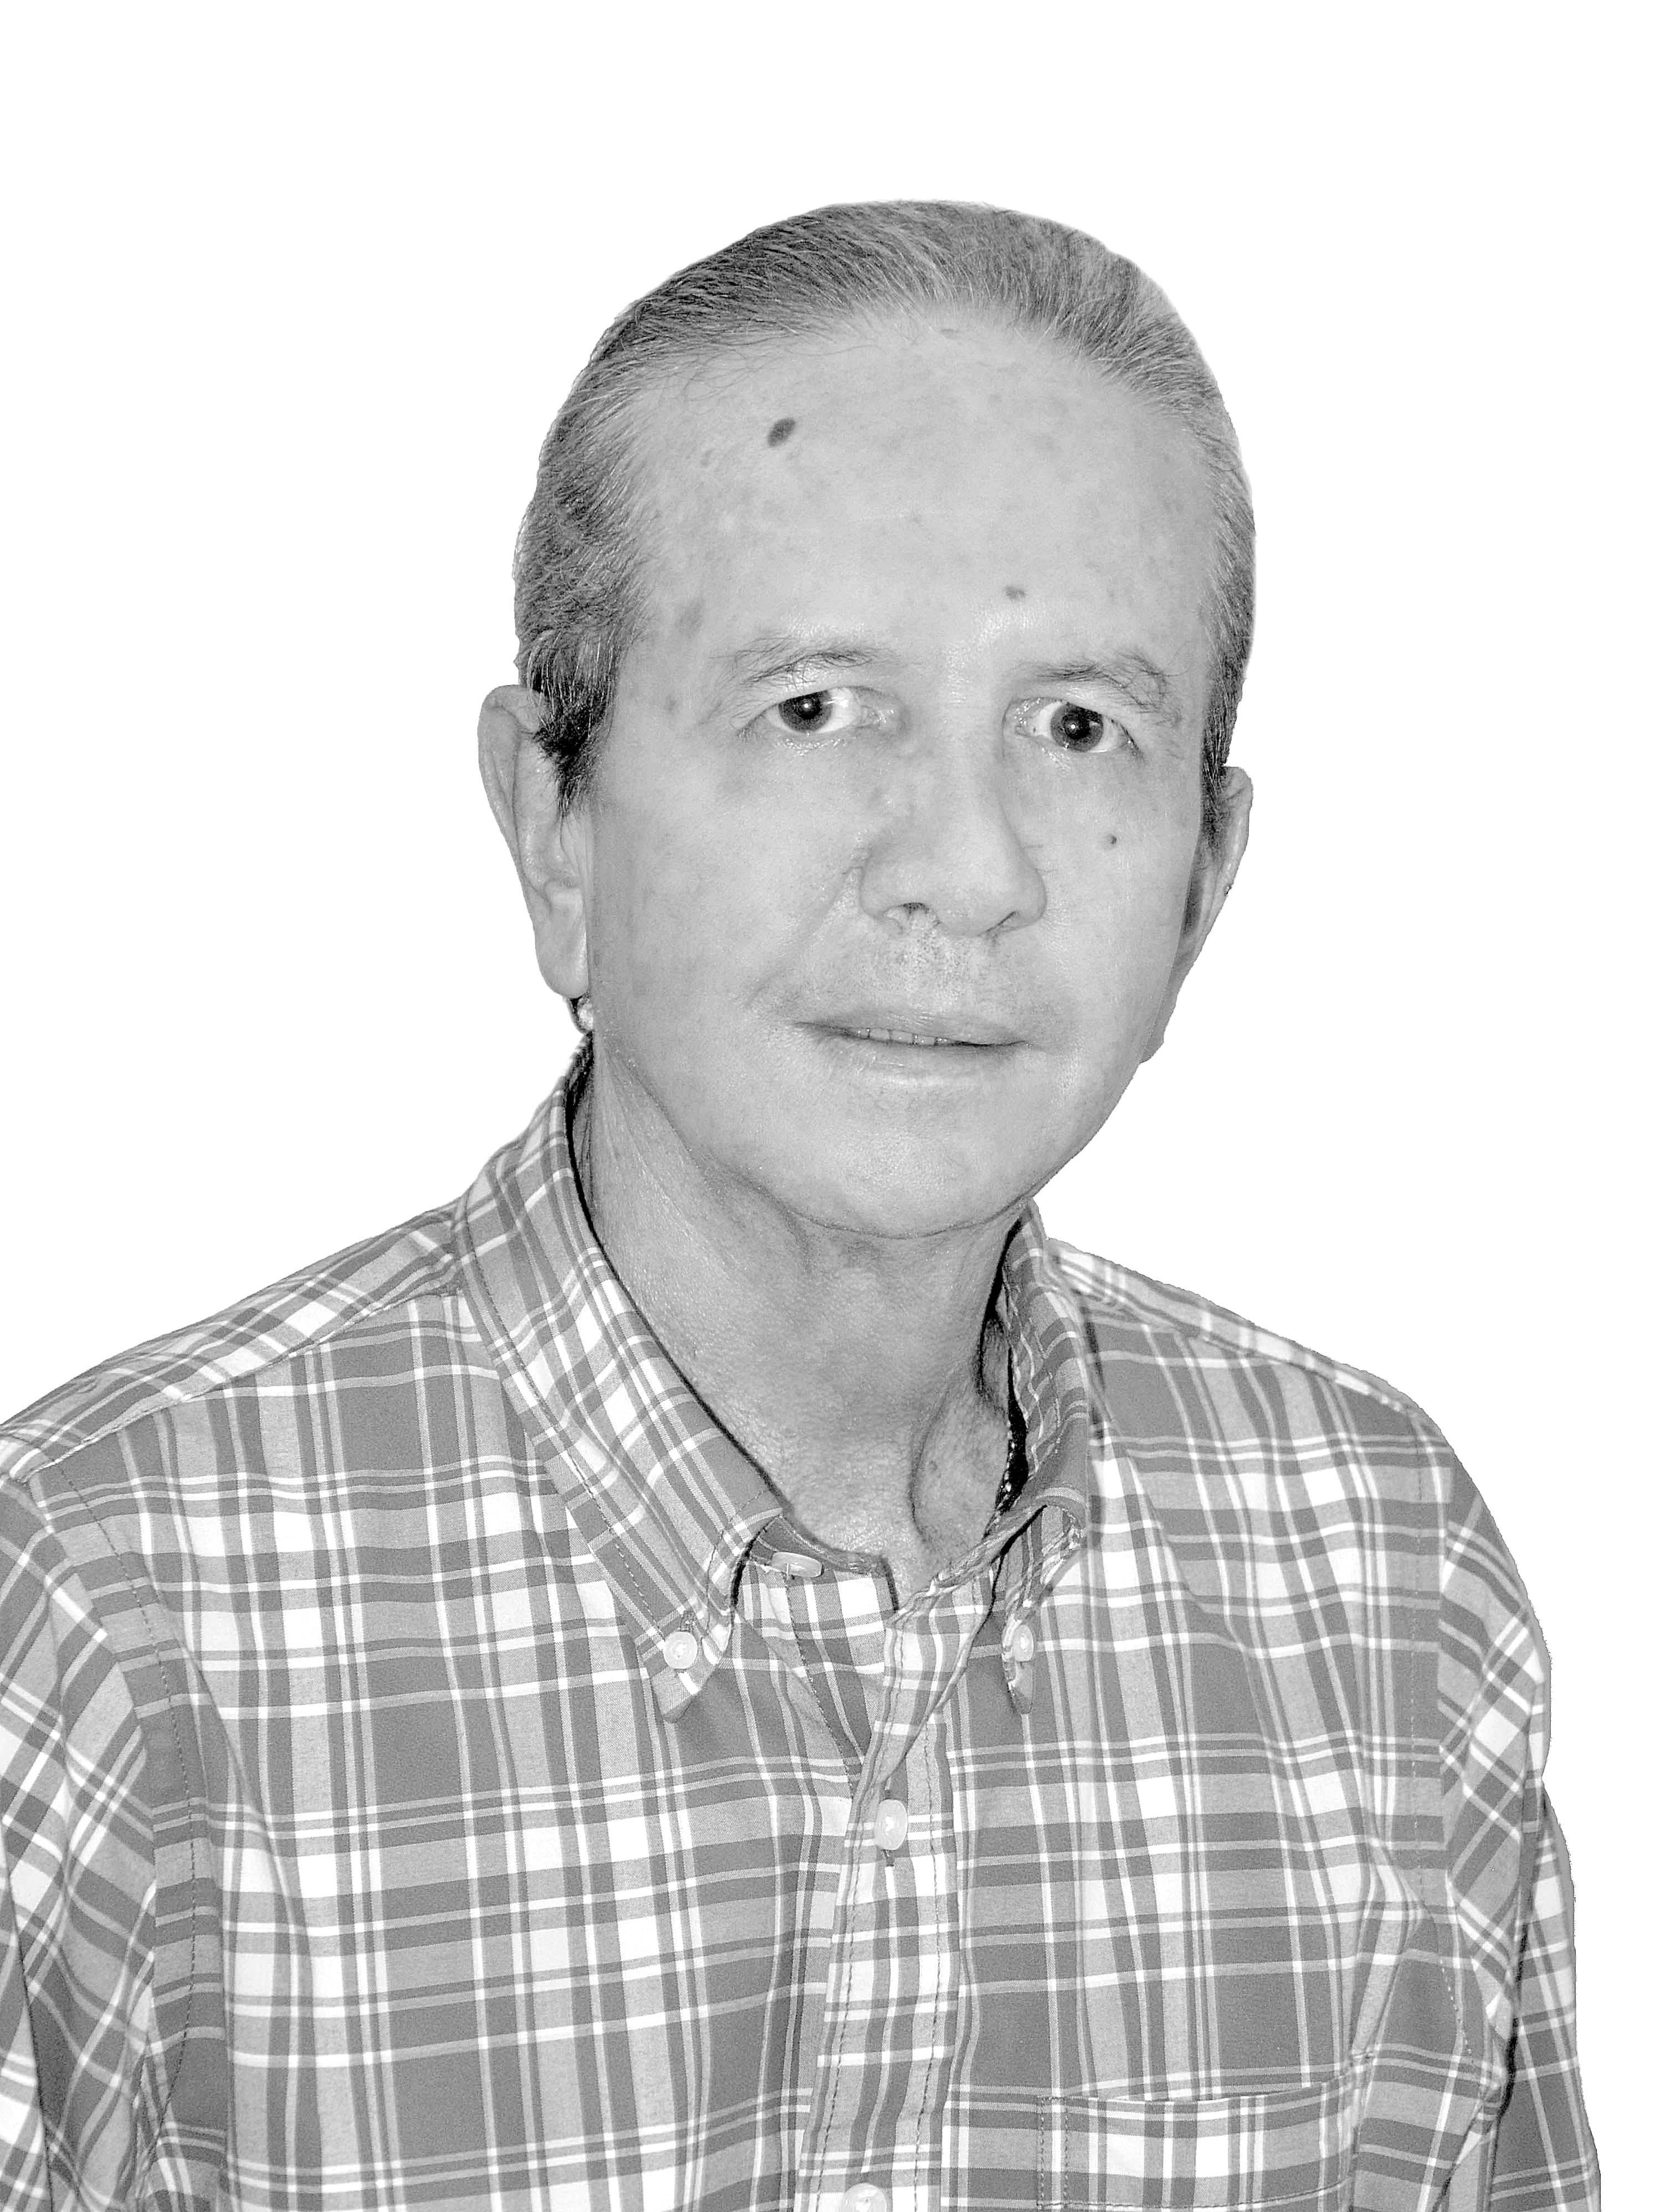 Maricadas de la Corte Por Héctor Gómez Kabariq | EL FRENTE